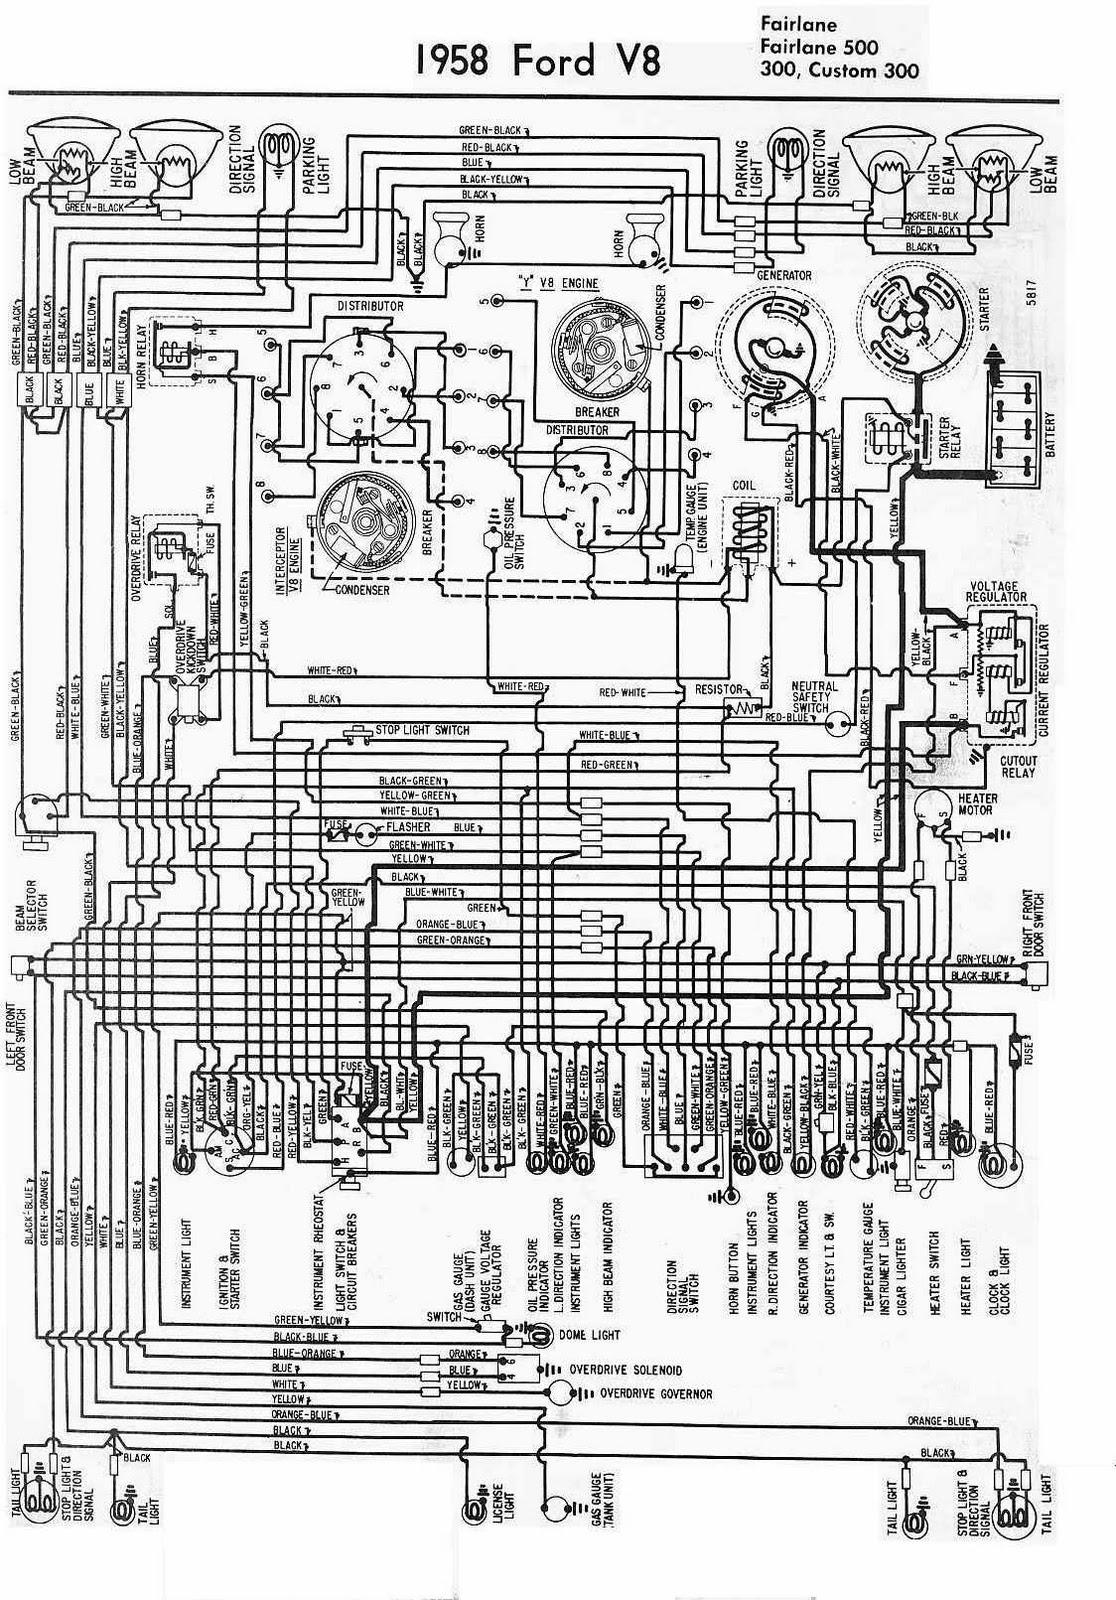 Exelent Stewart Warner Voltmeter Wiring Diagram Mold - Wiring ...